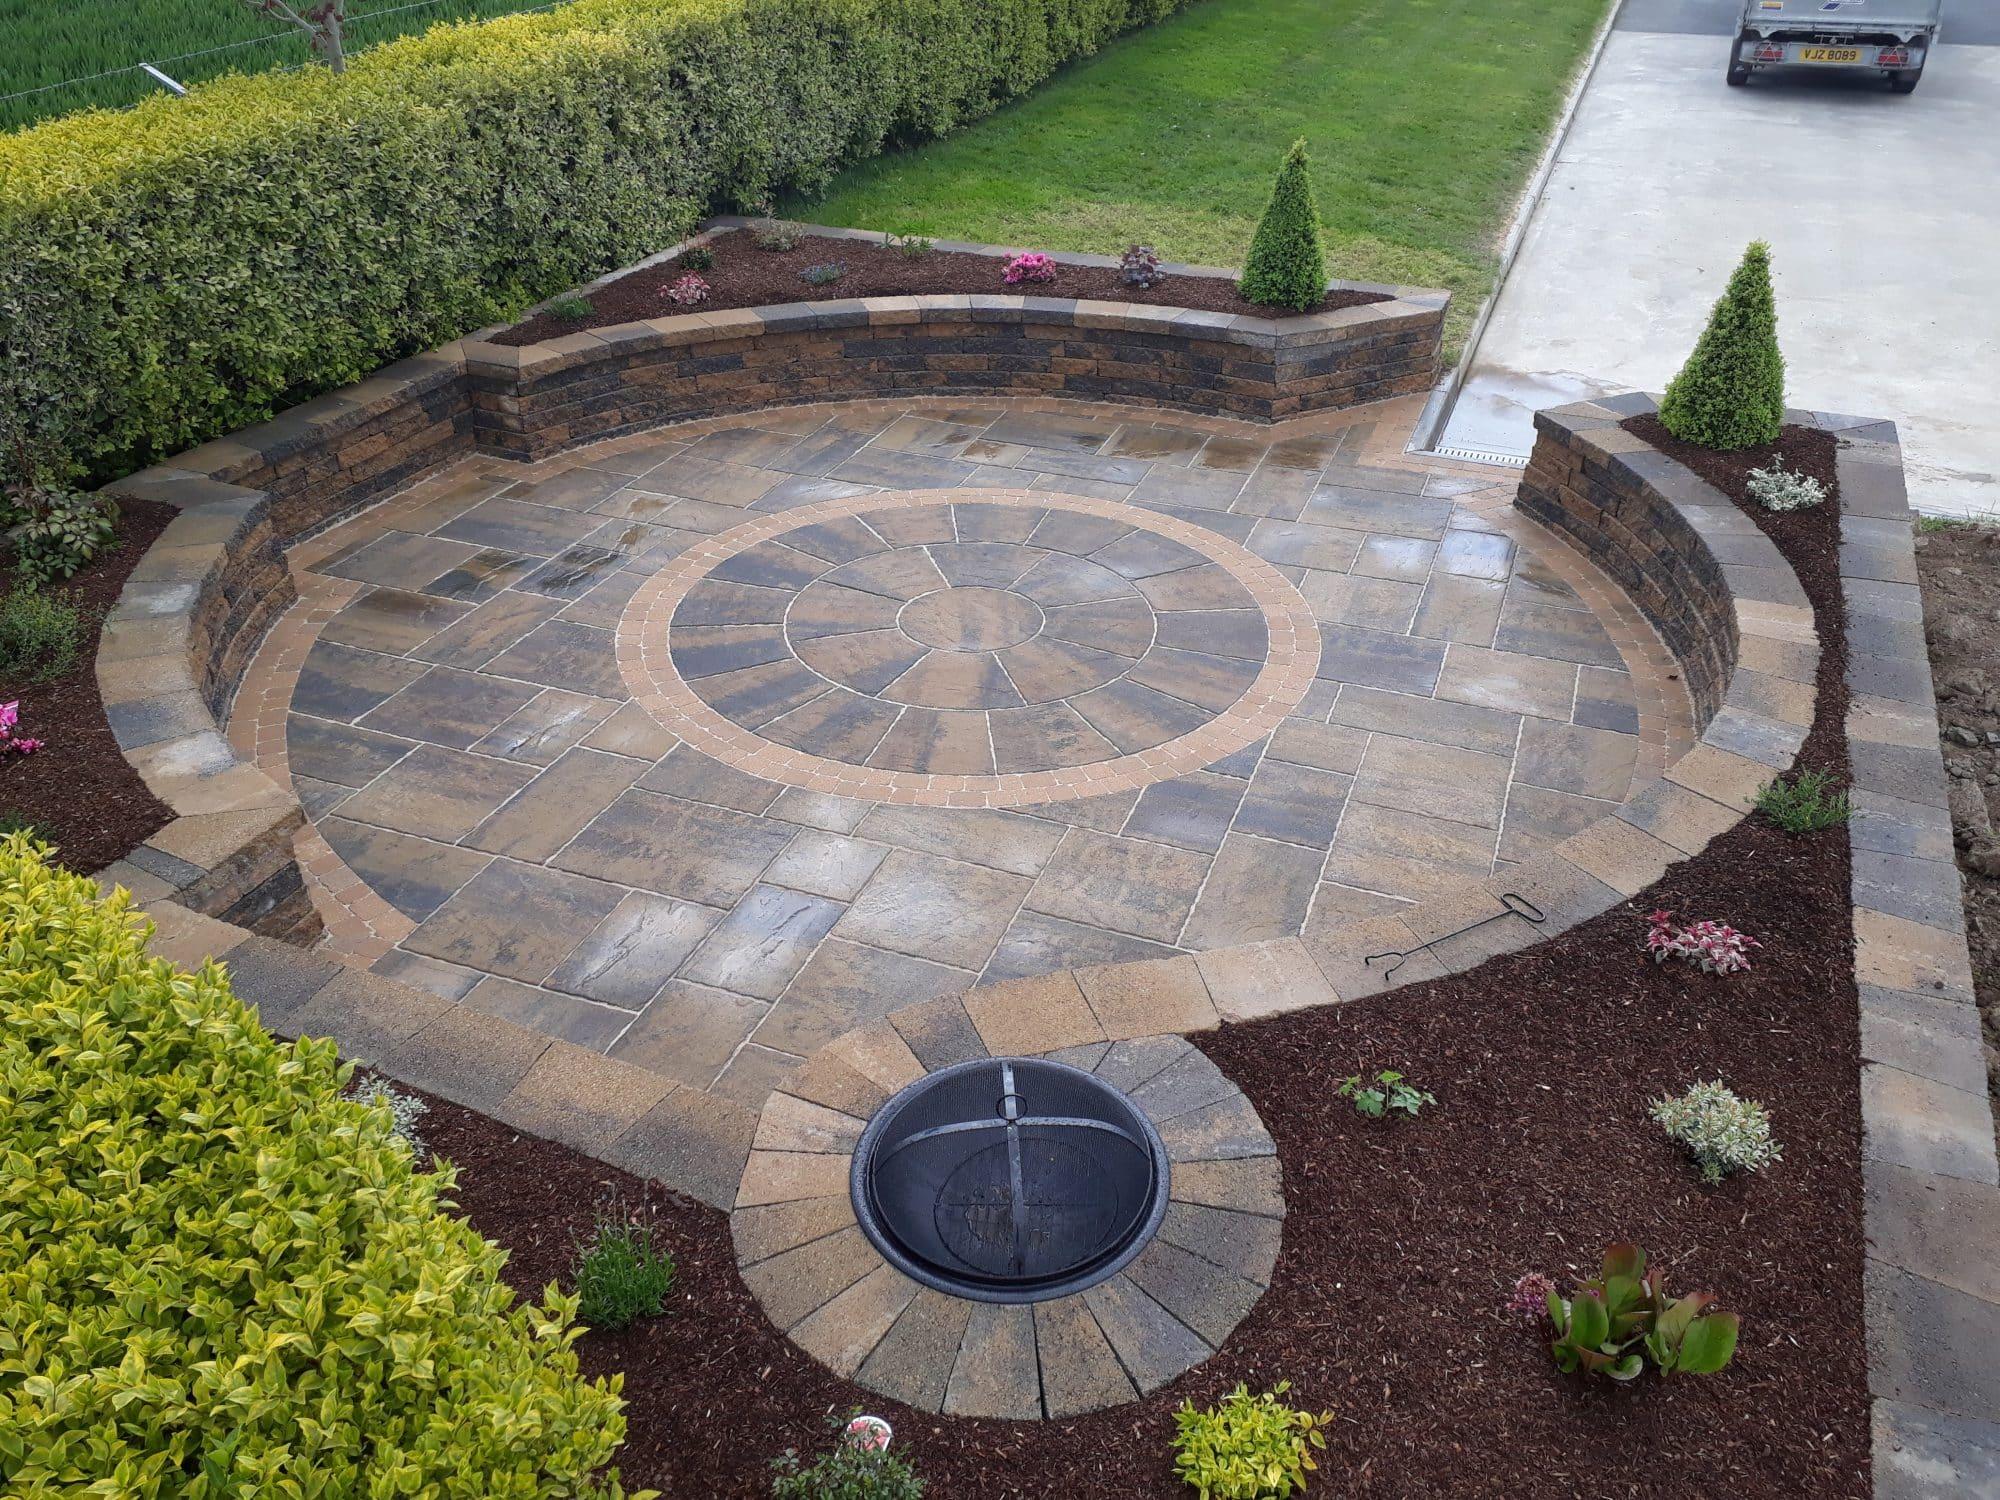 tobermore-historic-flags-circle-bracken-tegula-setts-golden-secura-lite-bracken-greenhill-garden-solutions-mytobermore-1.jpg